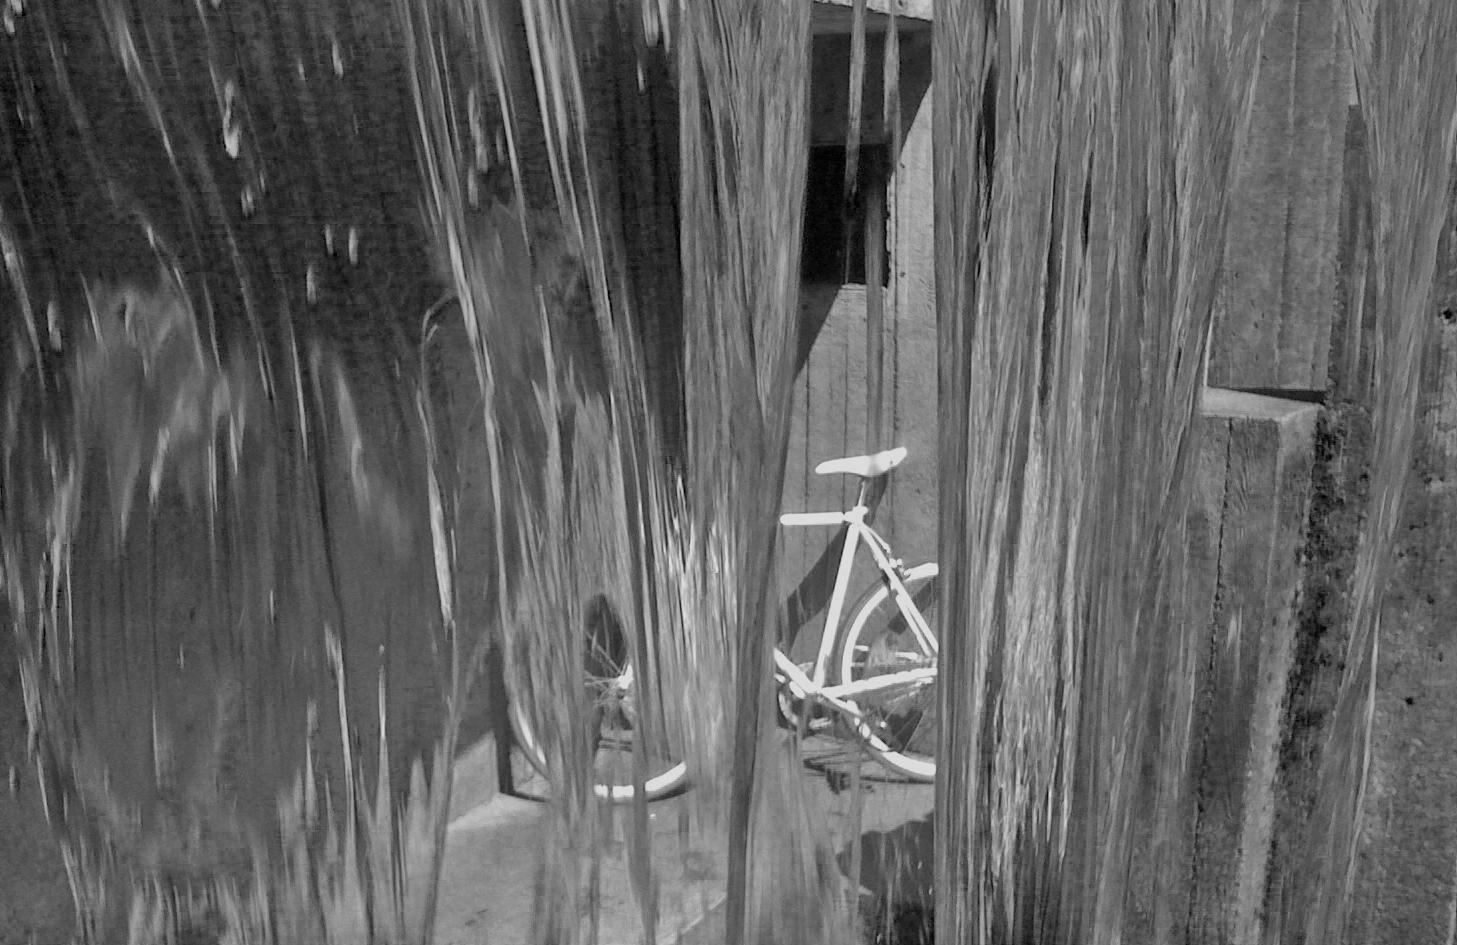 Ghost bike at Keller Fountain Park - Nathaniel Barber Blog